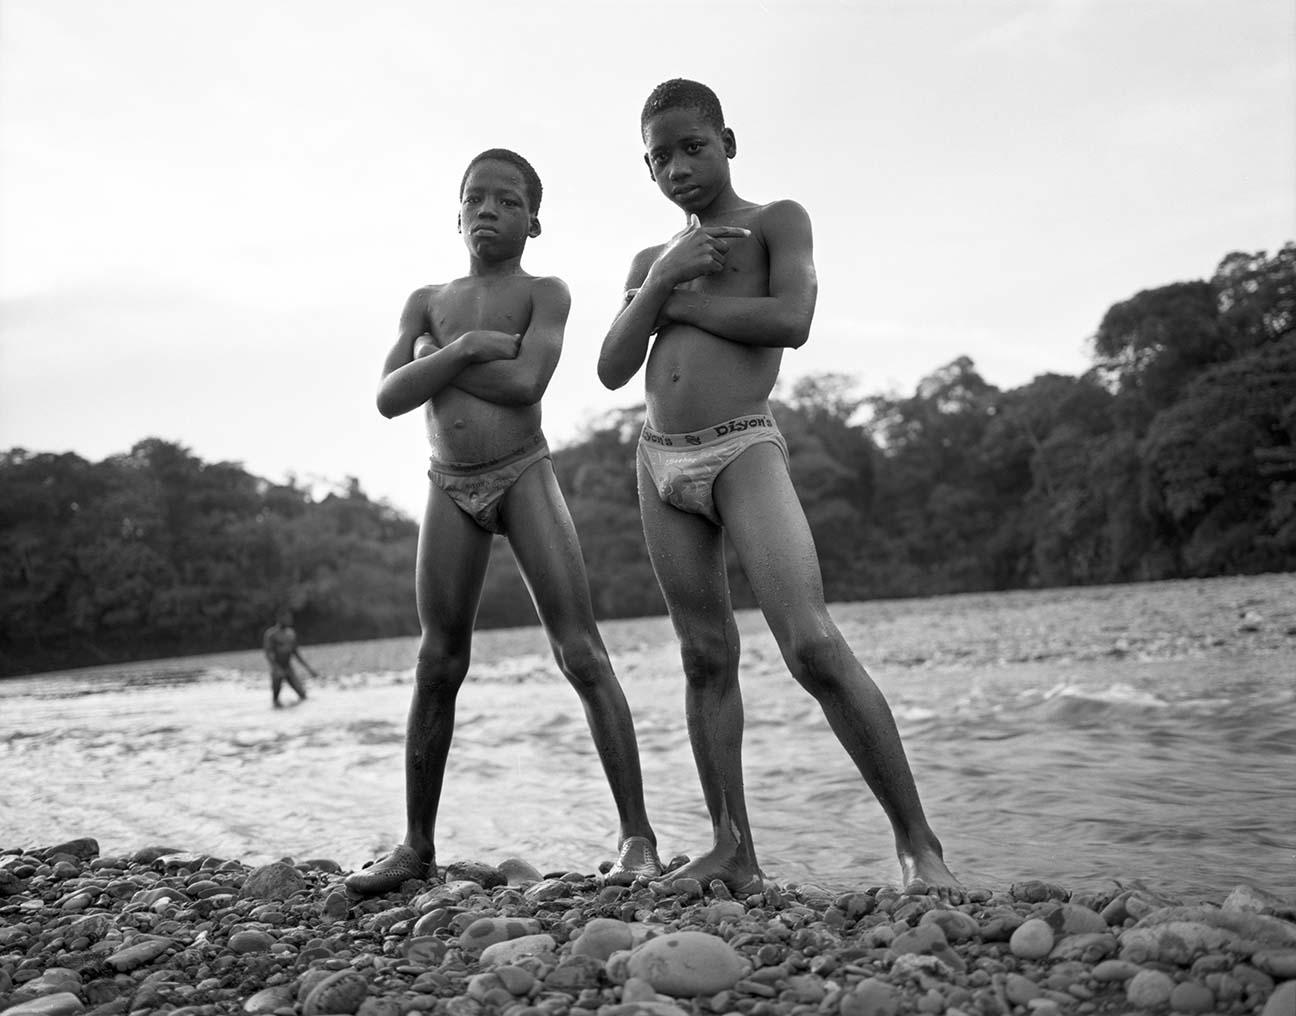 gallery-of-naked-samoan-boys-own